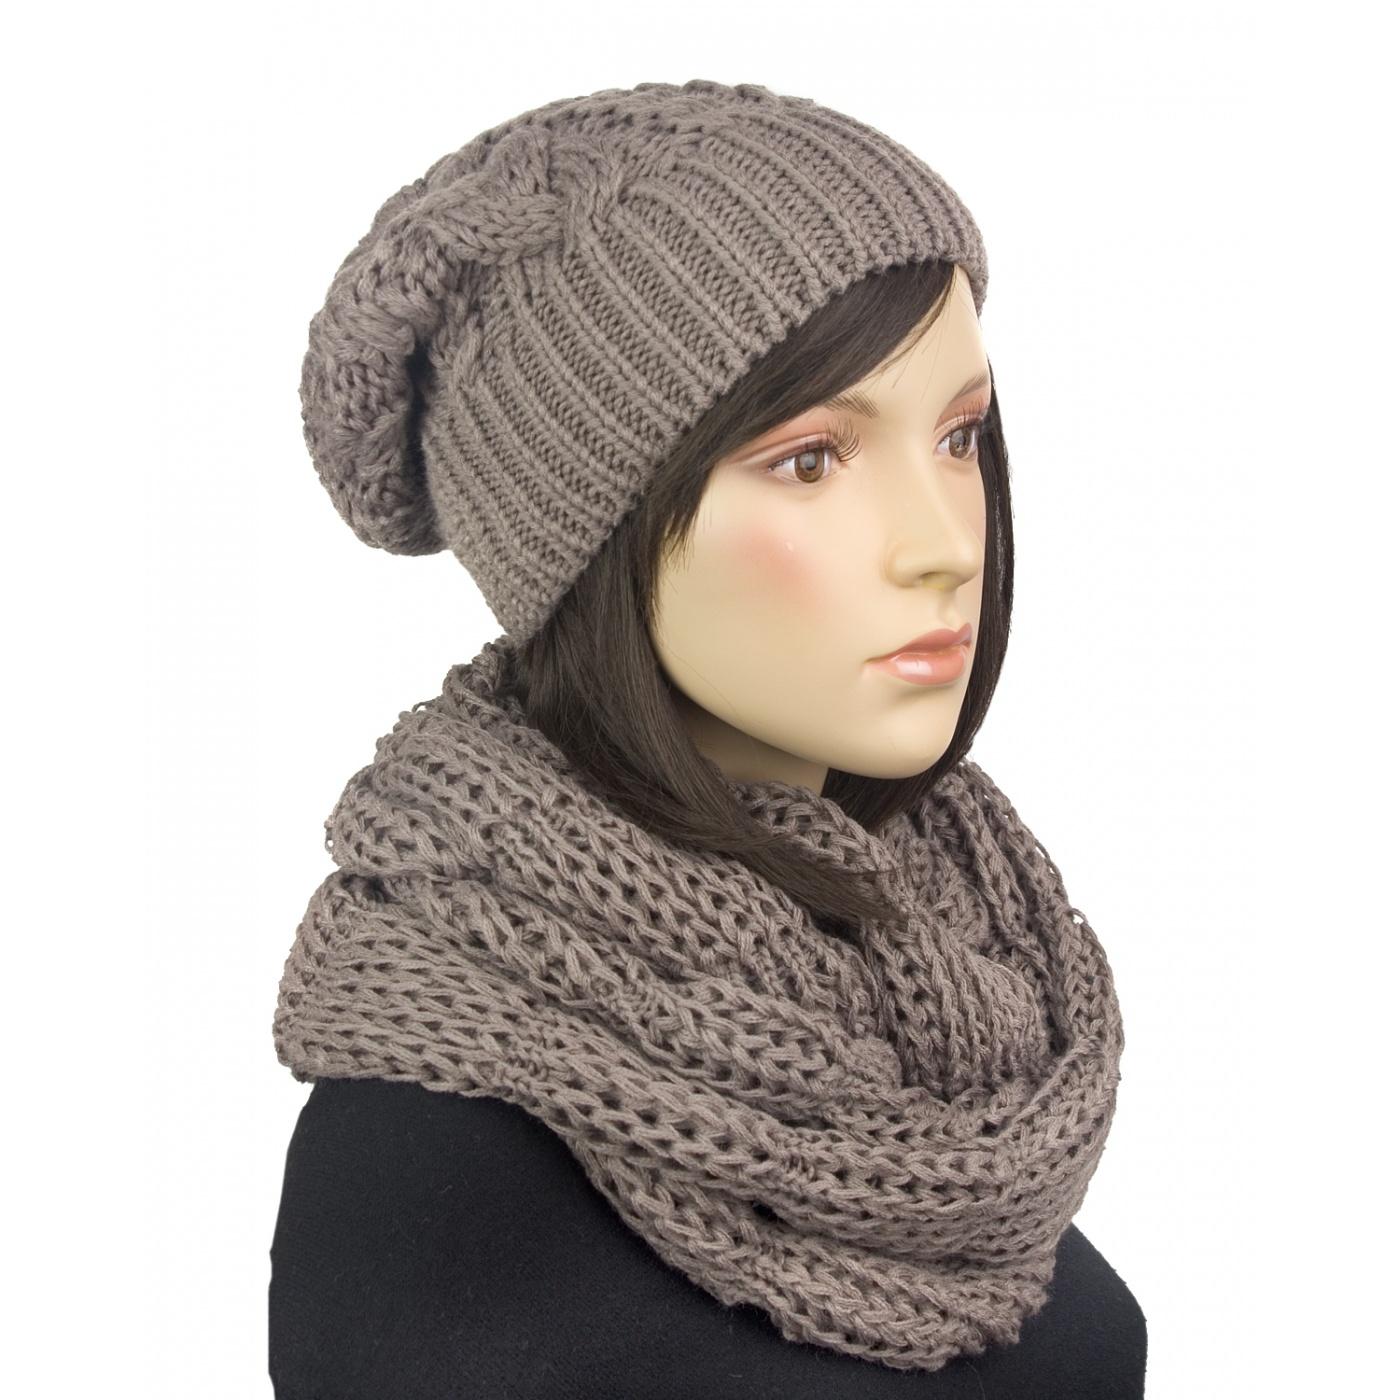 Komplet - stylowa zimowa czapka damska i szal komin: cappuccino